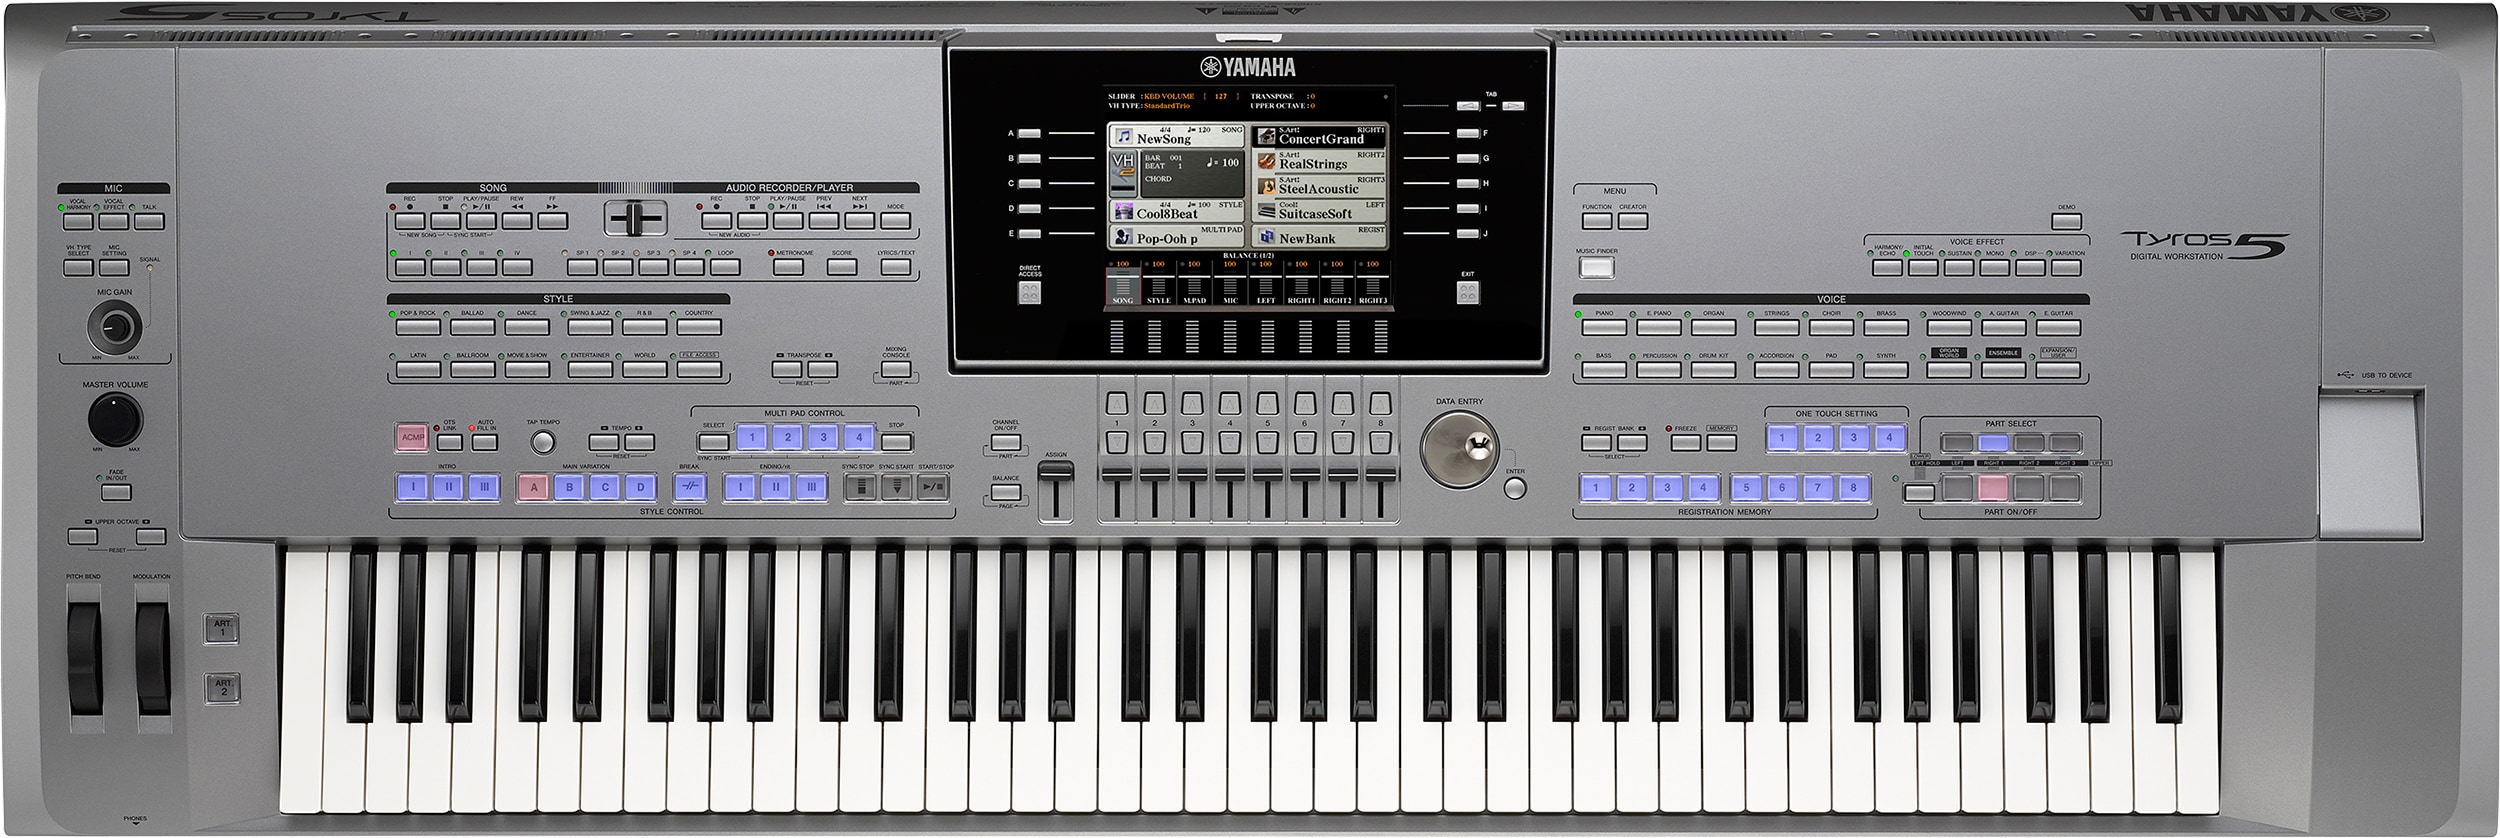 Yamaha Organ Demonstration